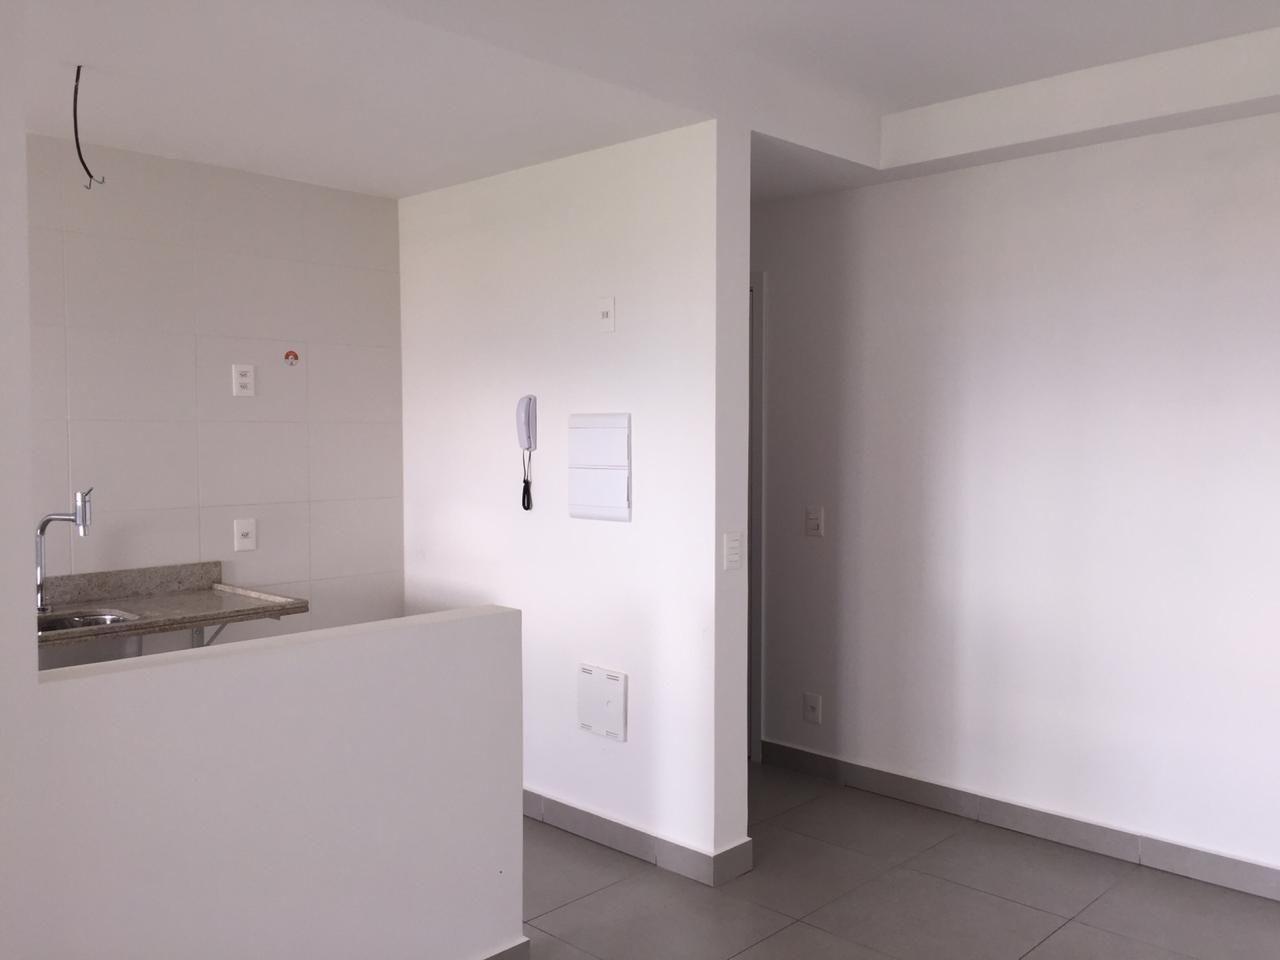 303 - Apto Quinta da Primavera 66 m²